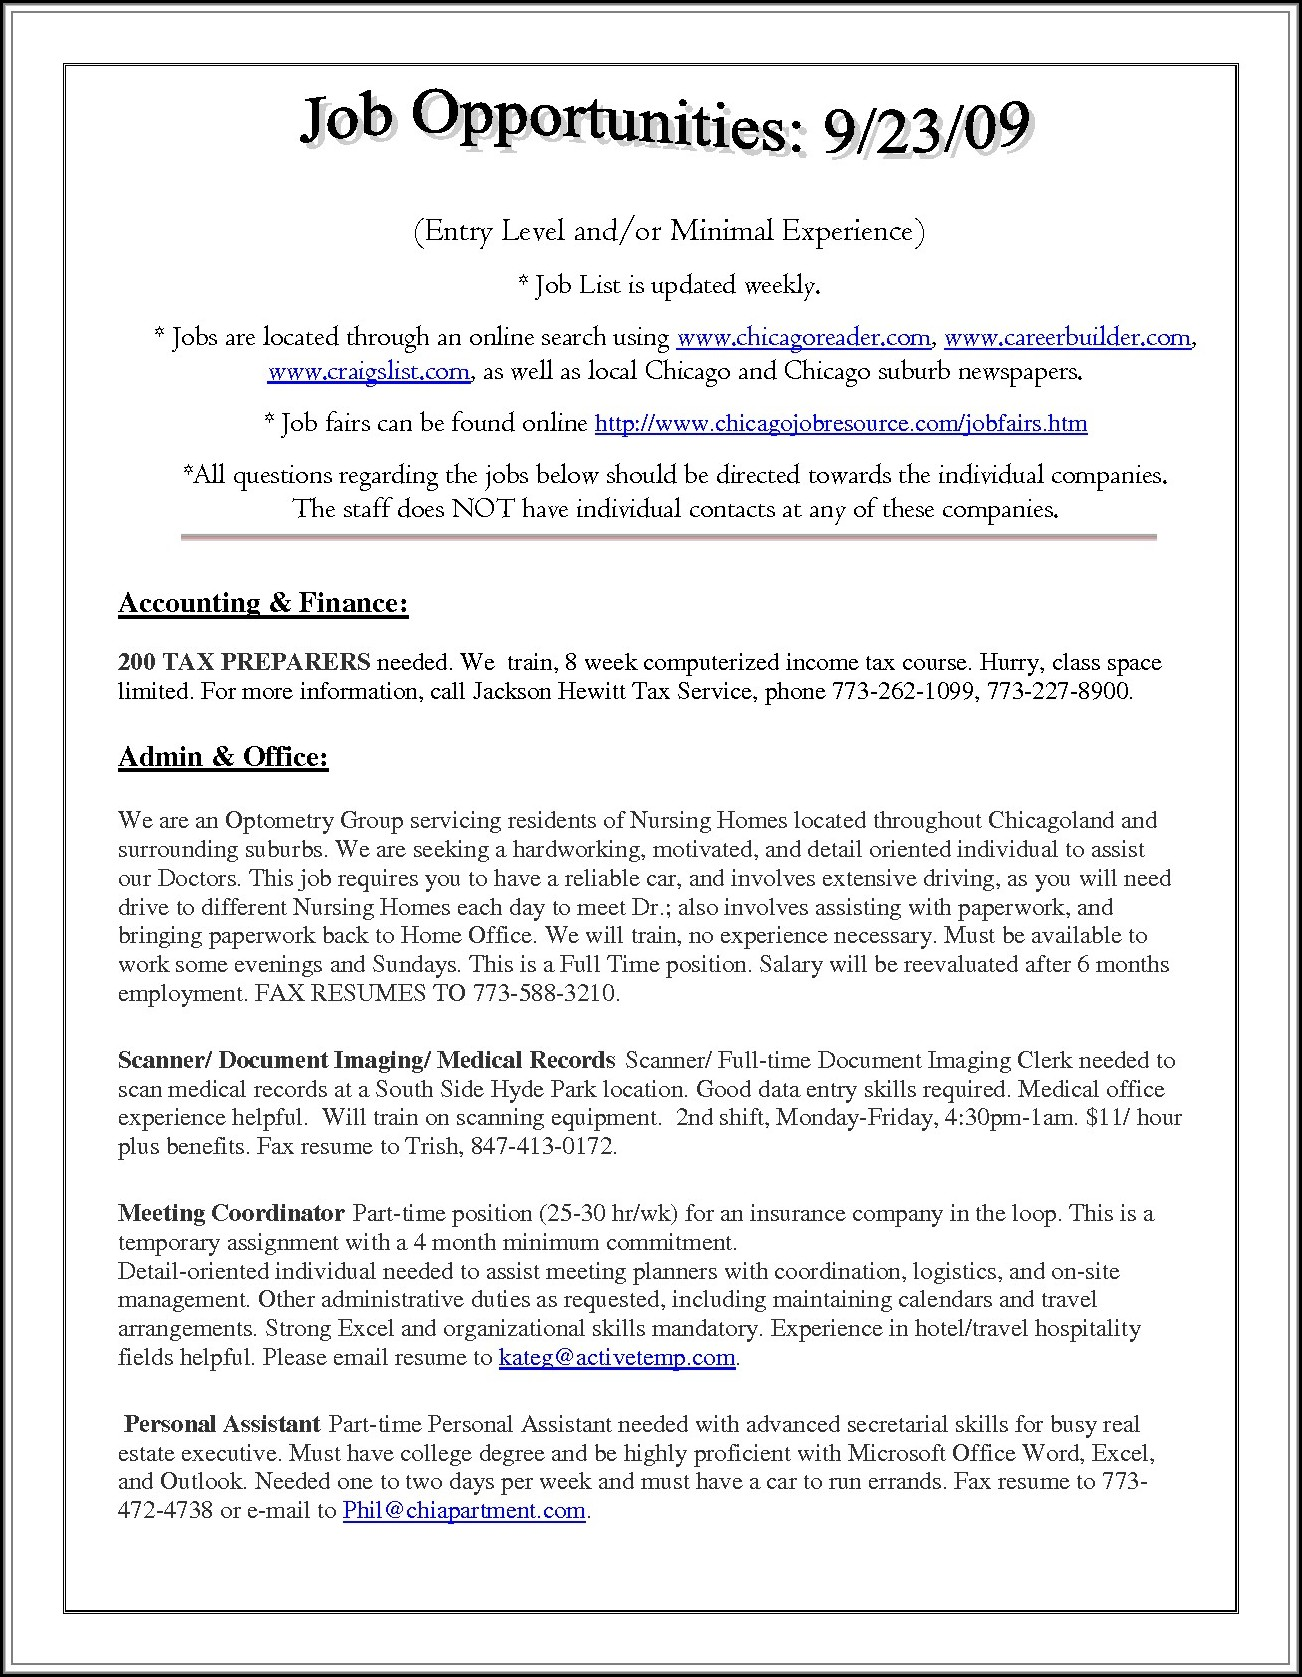 Sample Resume For Nursing Assistant Entry Level